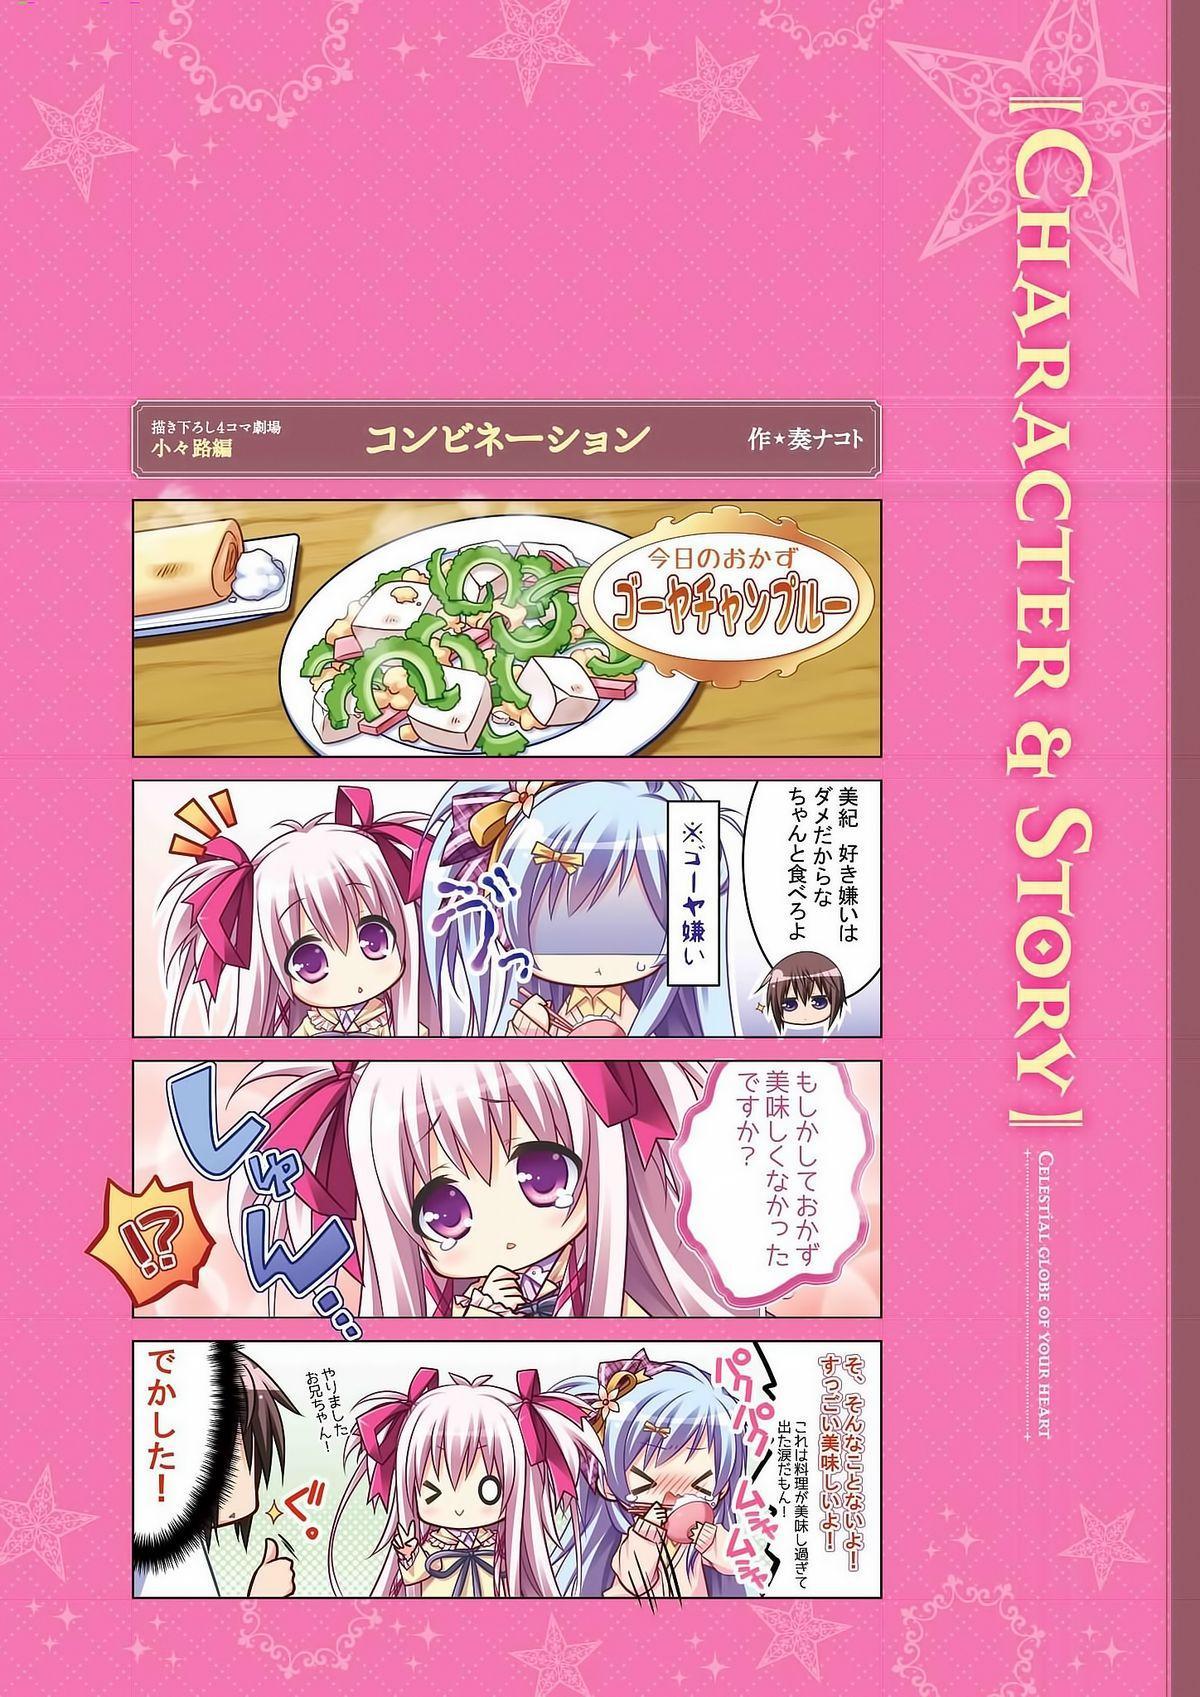 Sekai to Sekai no Mannaka de Visual Fanbook 4